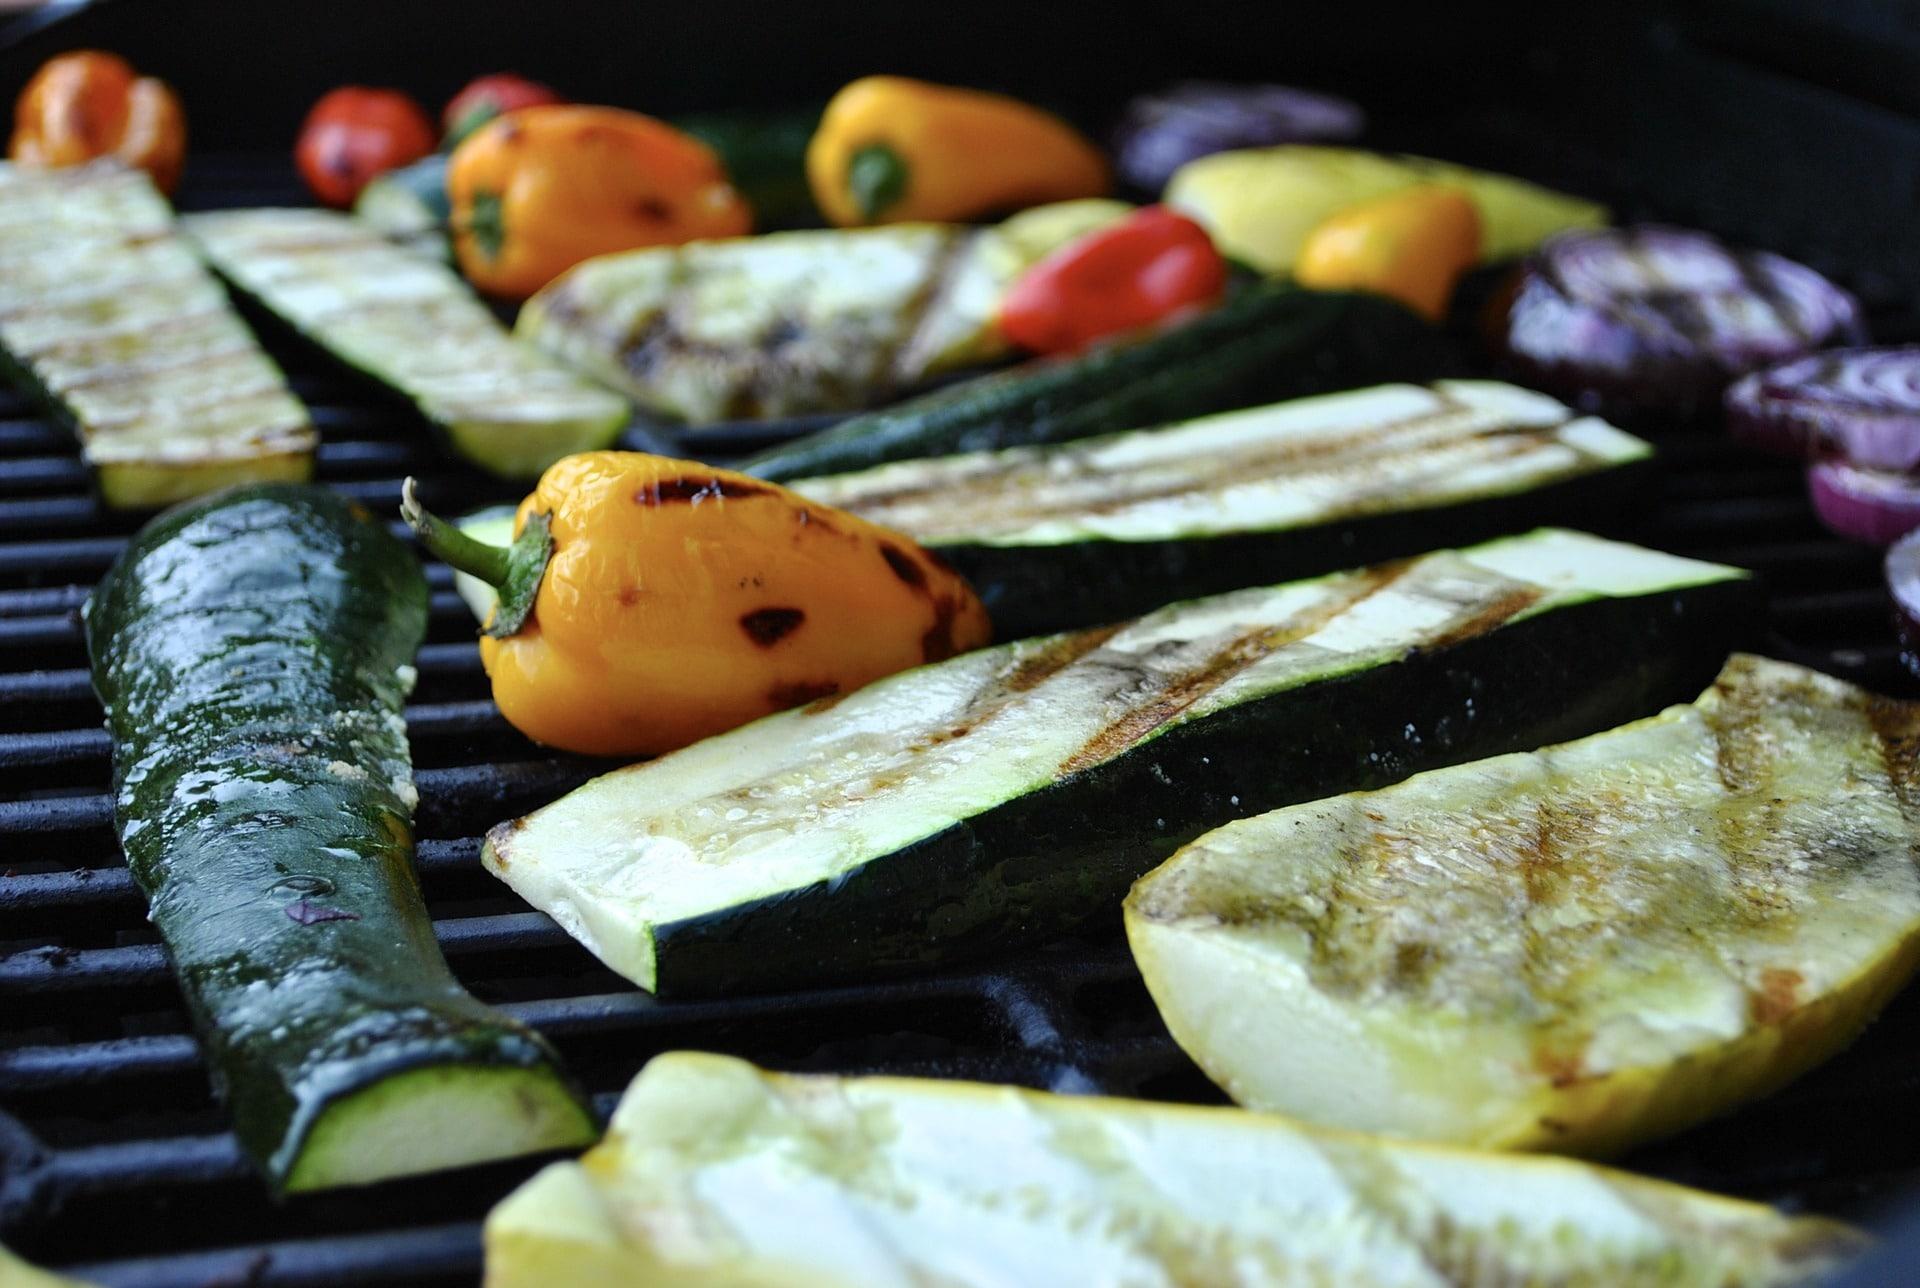 Grilled Zucchini, Squash and Asparagus Recipe via @mermaidsandmojitos